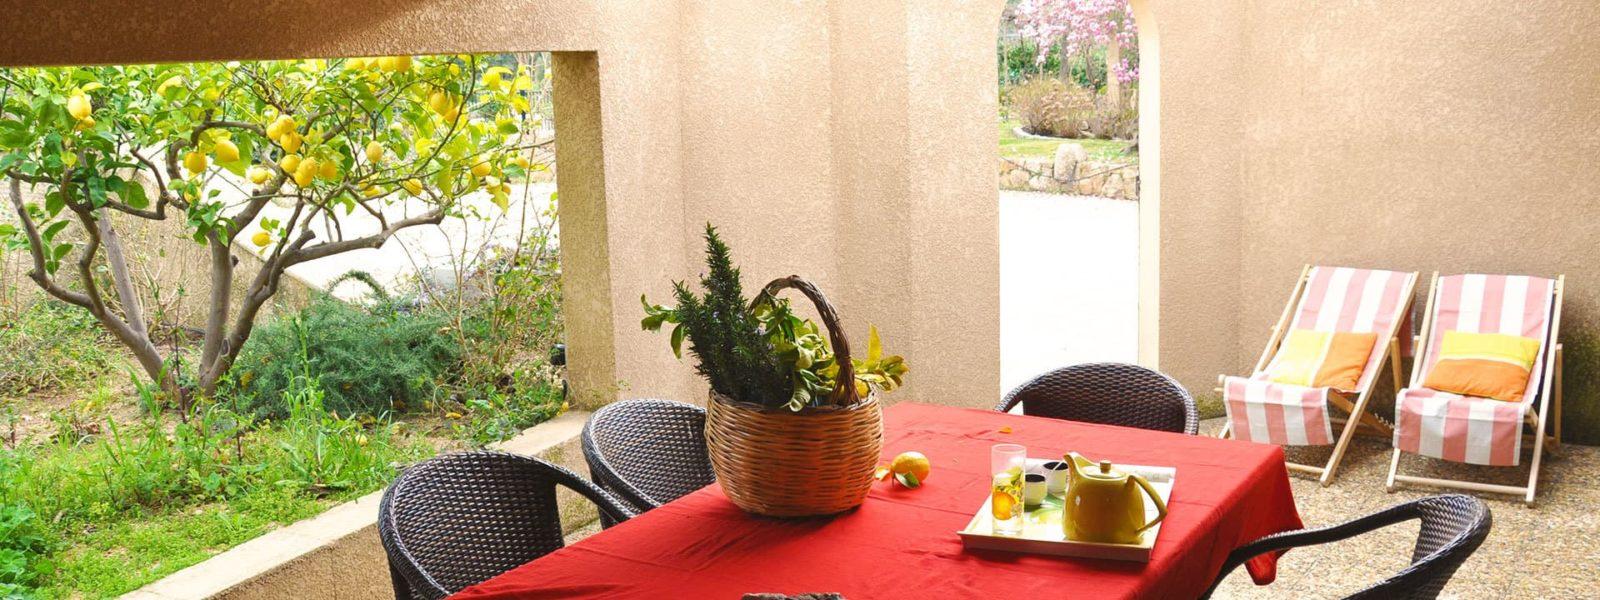 Location mini-villa pour 6 en Corse du Sud - Le Citronnier, Casa Favalella